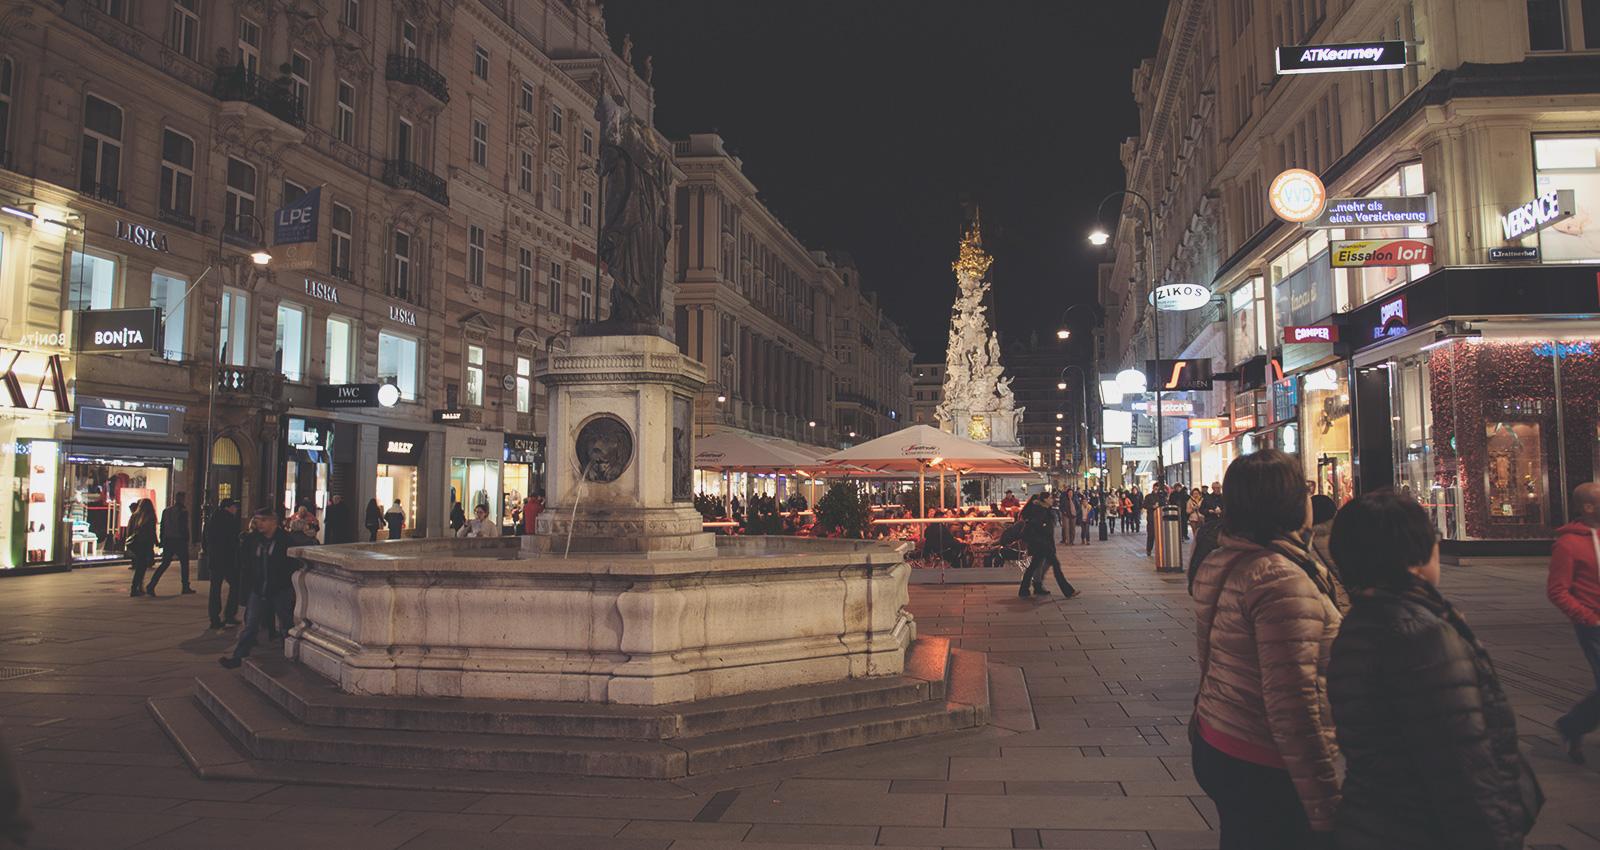 Wien_Budapest_Travel_151